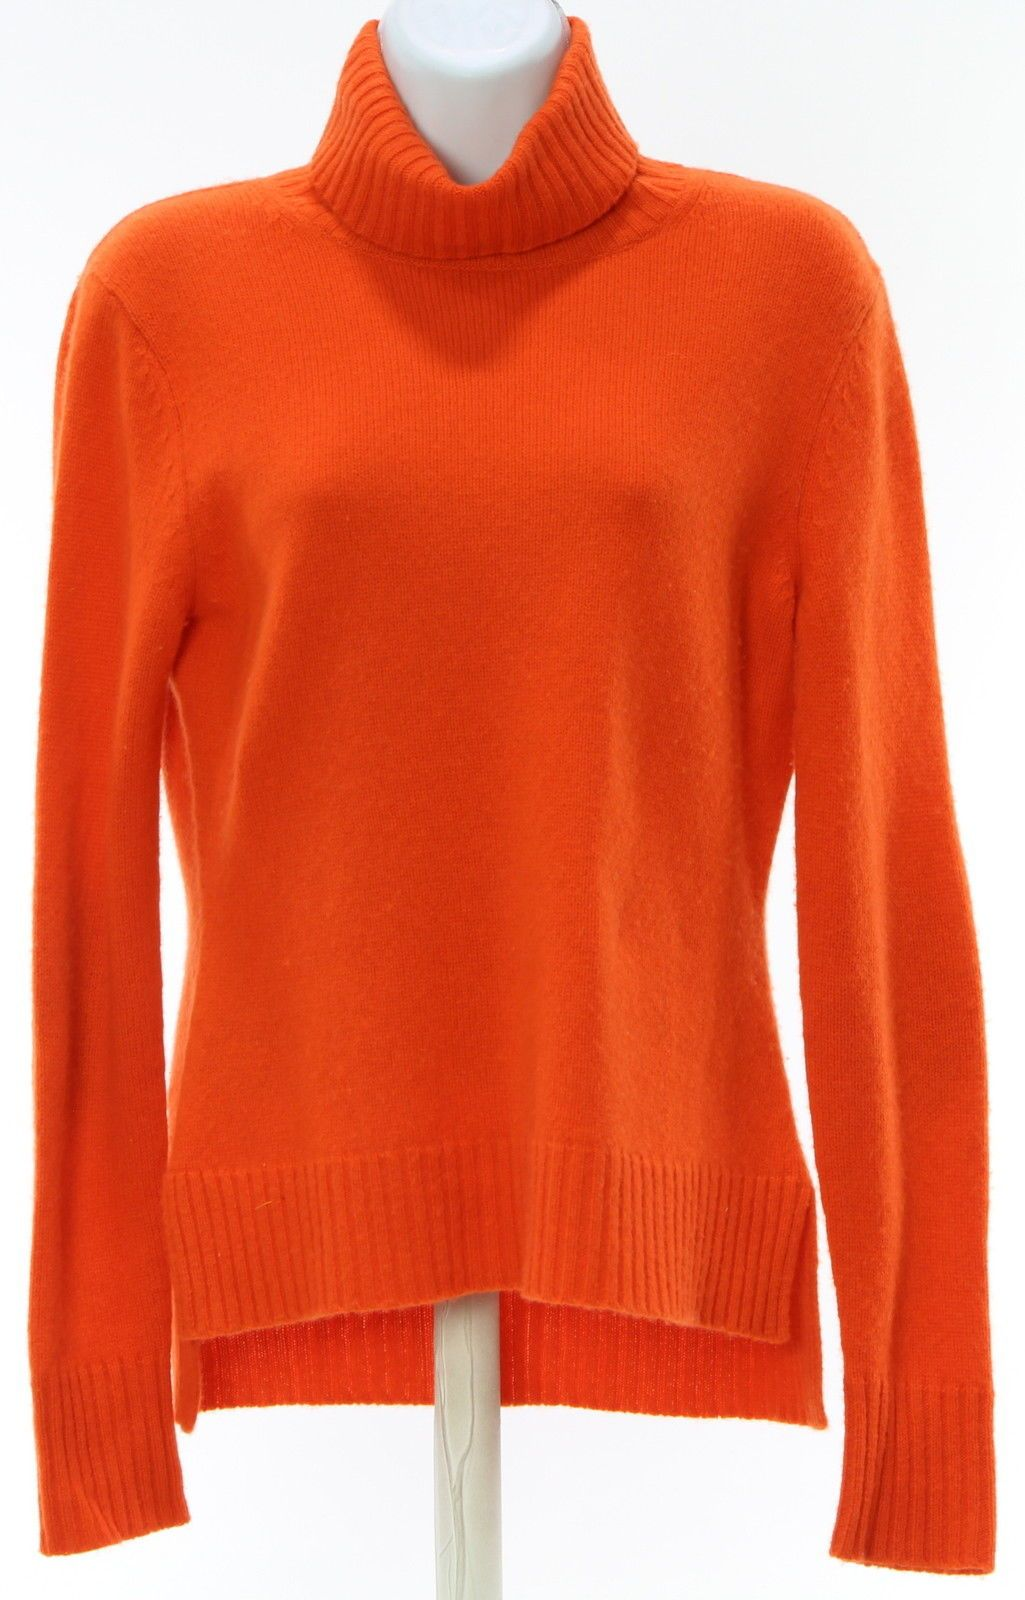 Womens NEIMAN MARCUS Orange 100% Cashmere Turtleneck Sweater Size ...